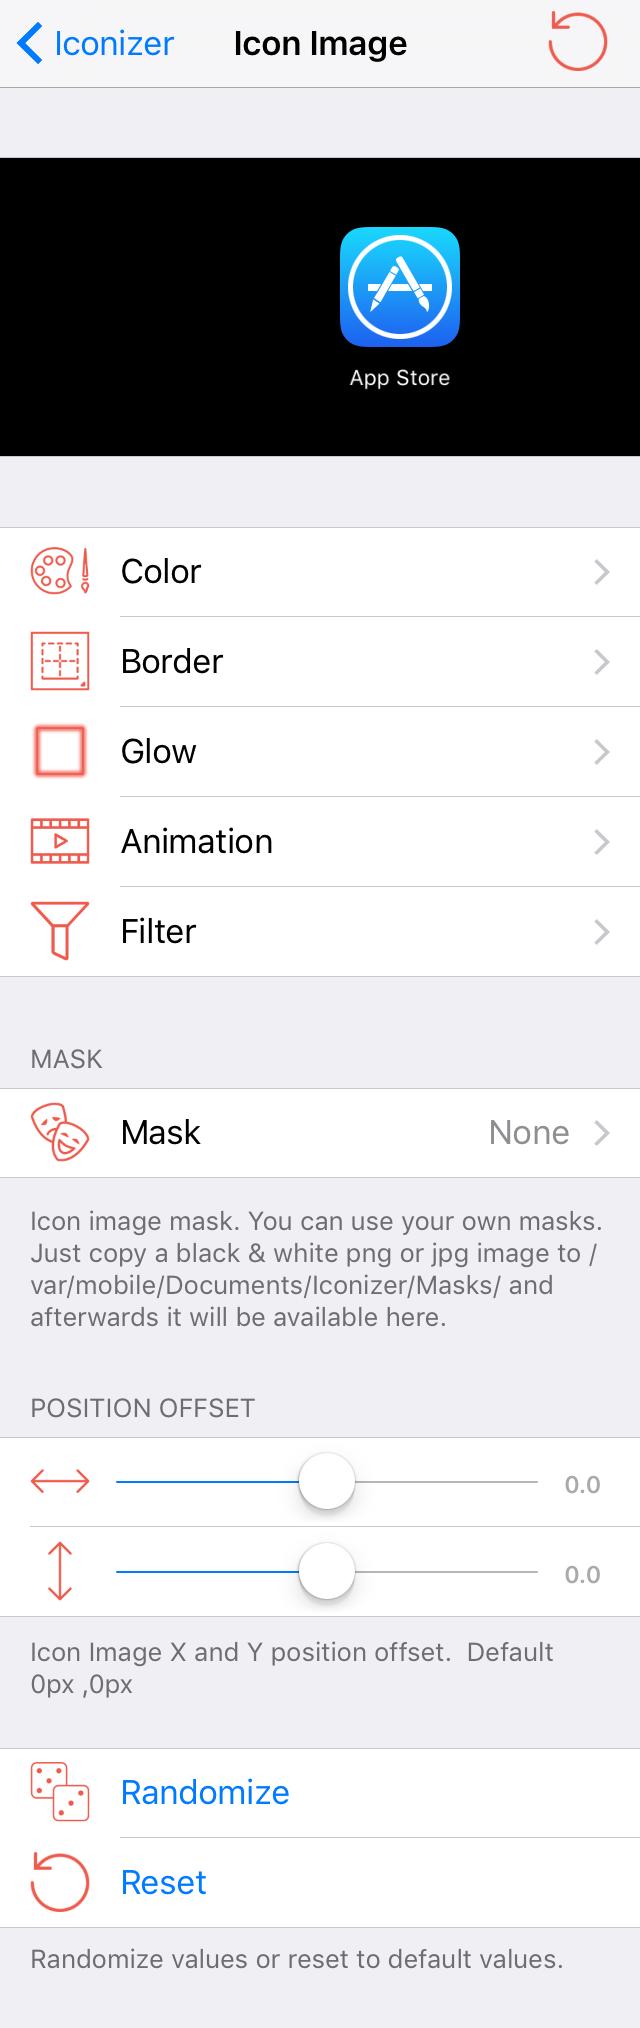 Iconizer Icon Image Preferences 2